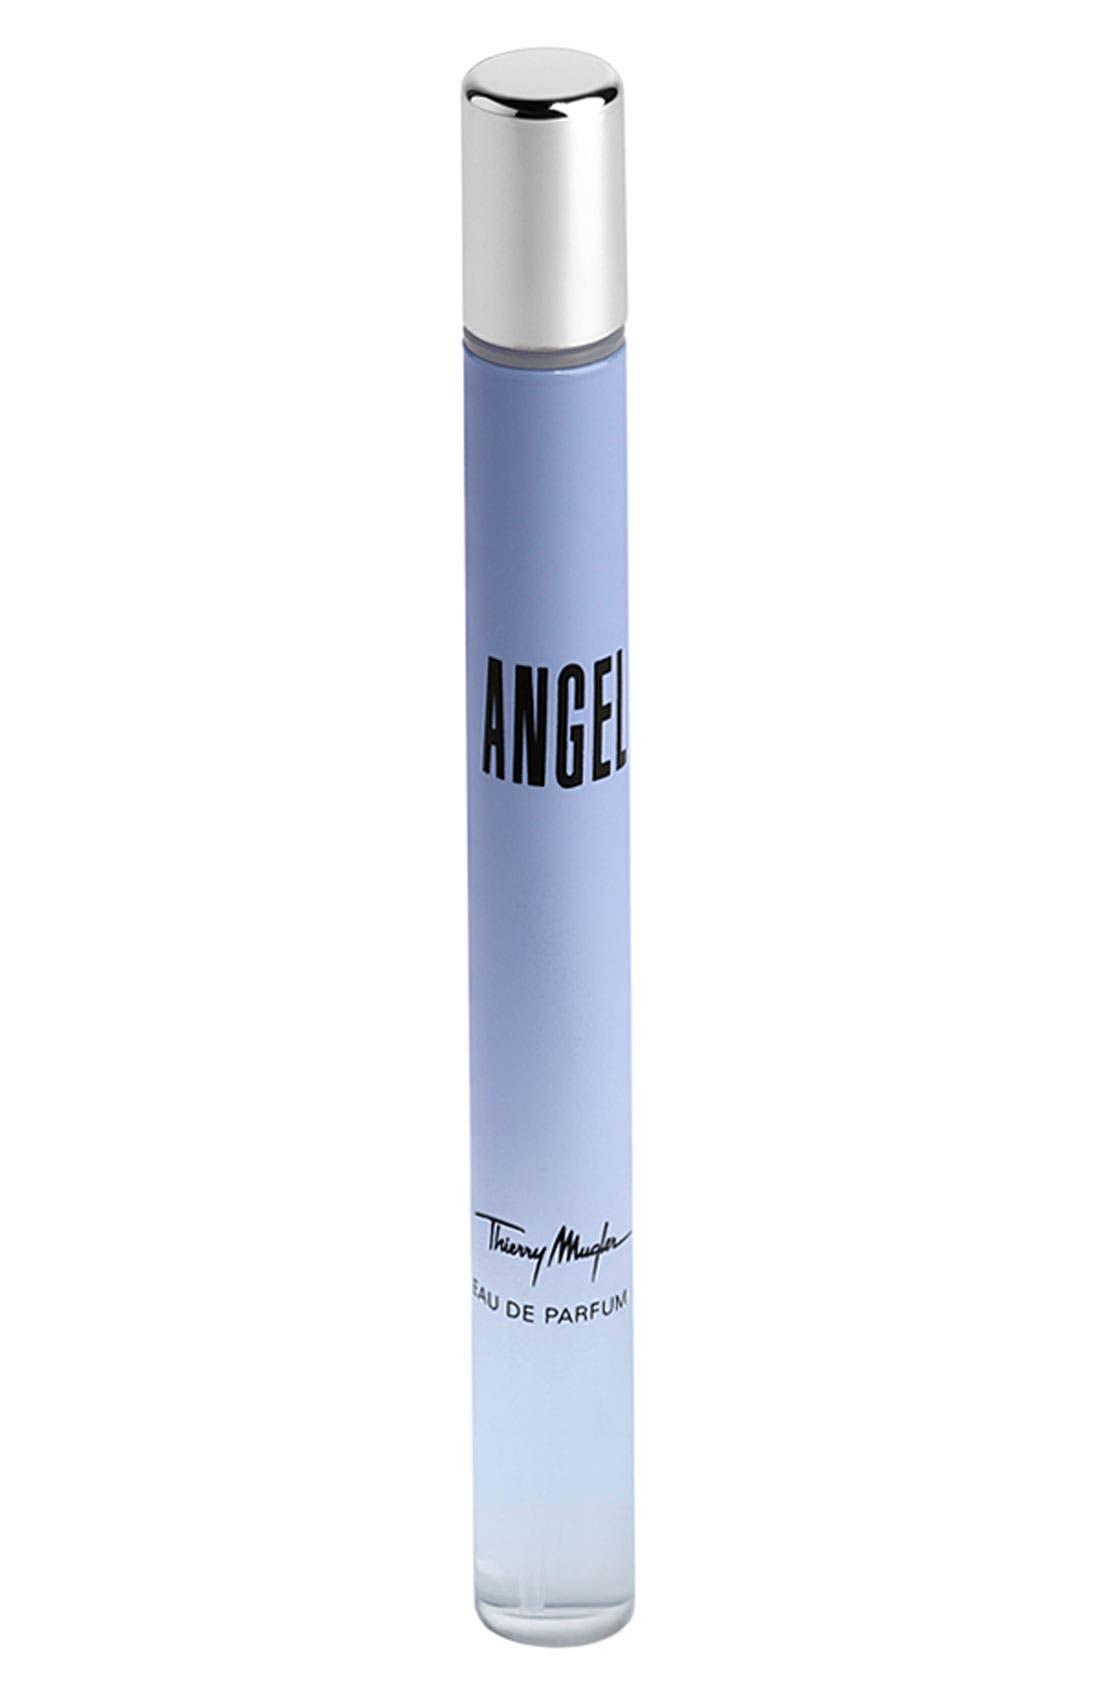 Angel by Mugler 'Delicious Whisper' Fragrance Spray